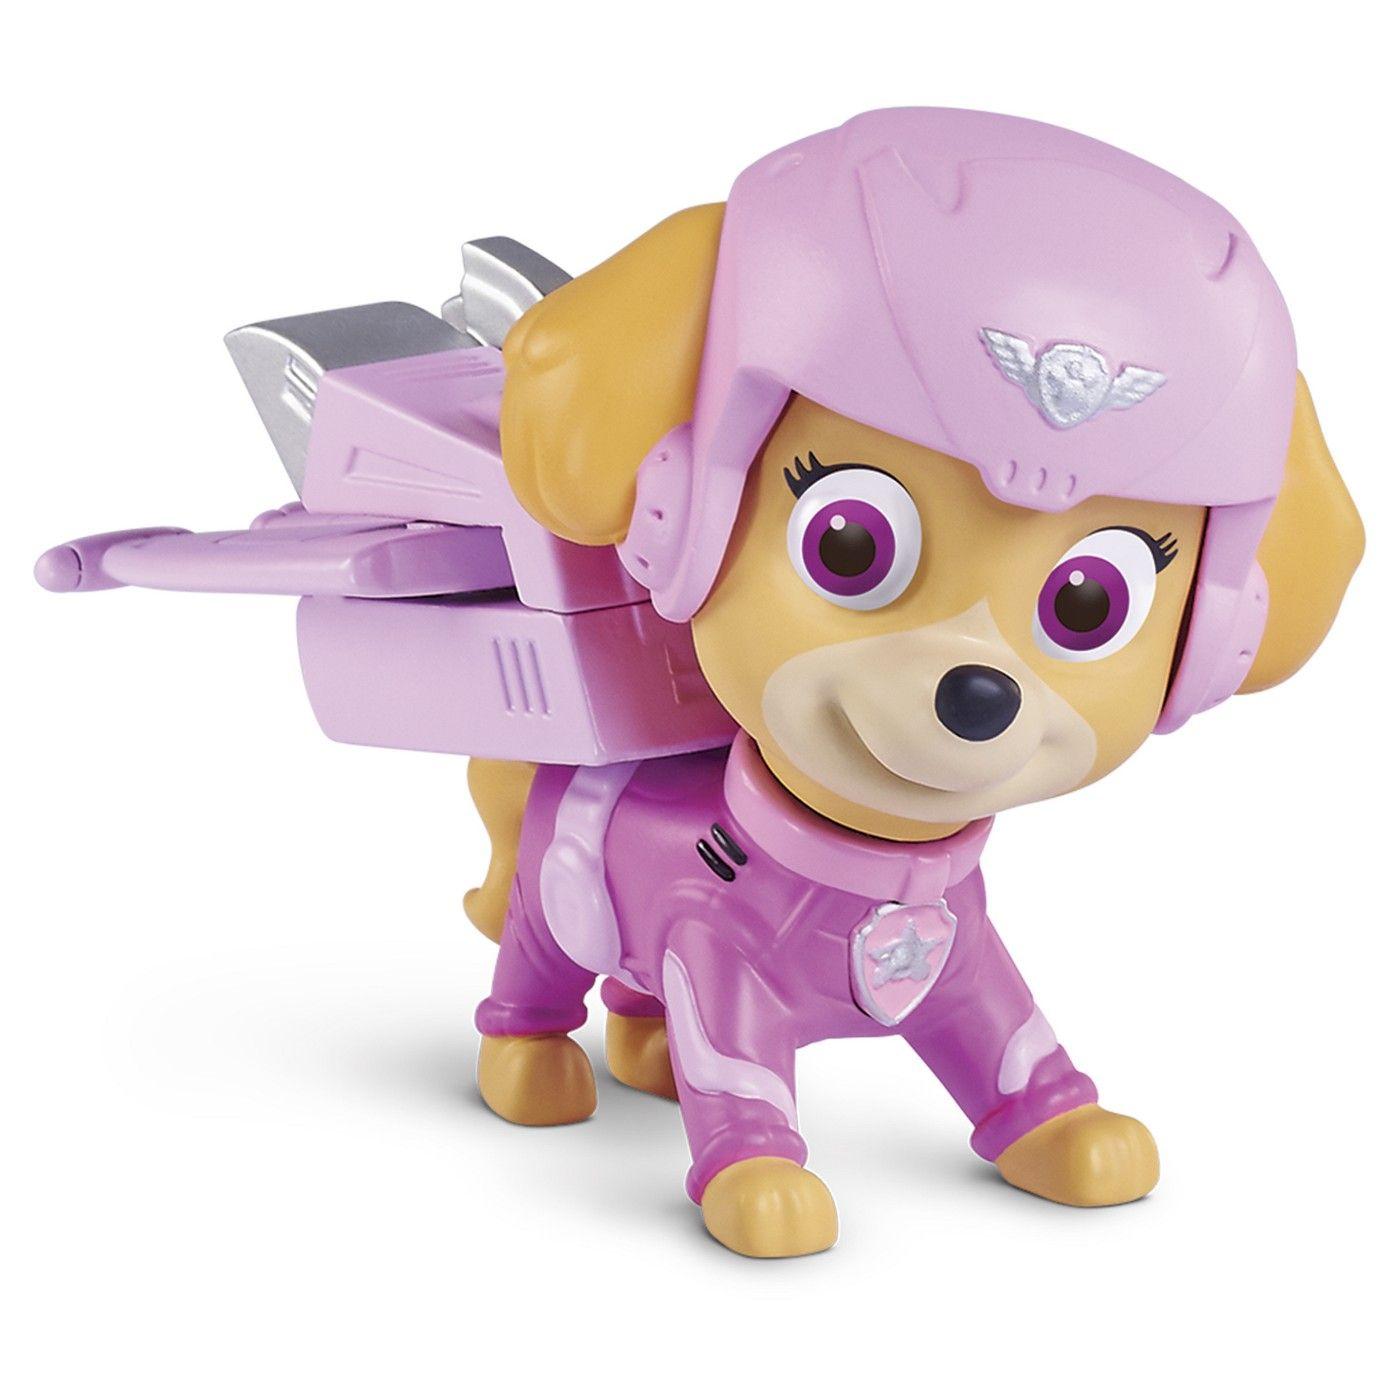 Paw Patrol - Air Rescue Skye, Pup Pack and Badge #Air